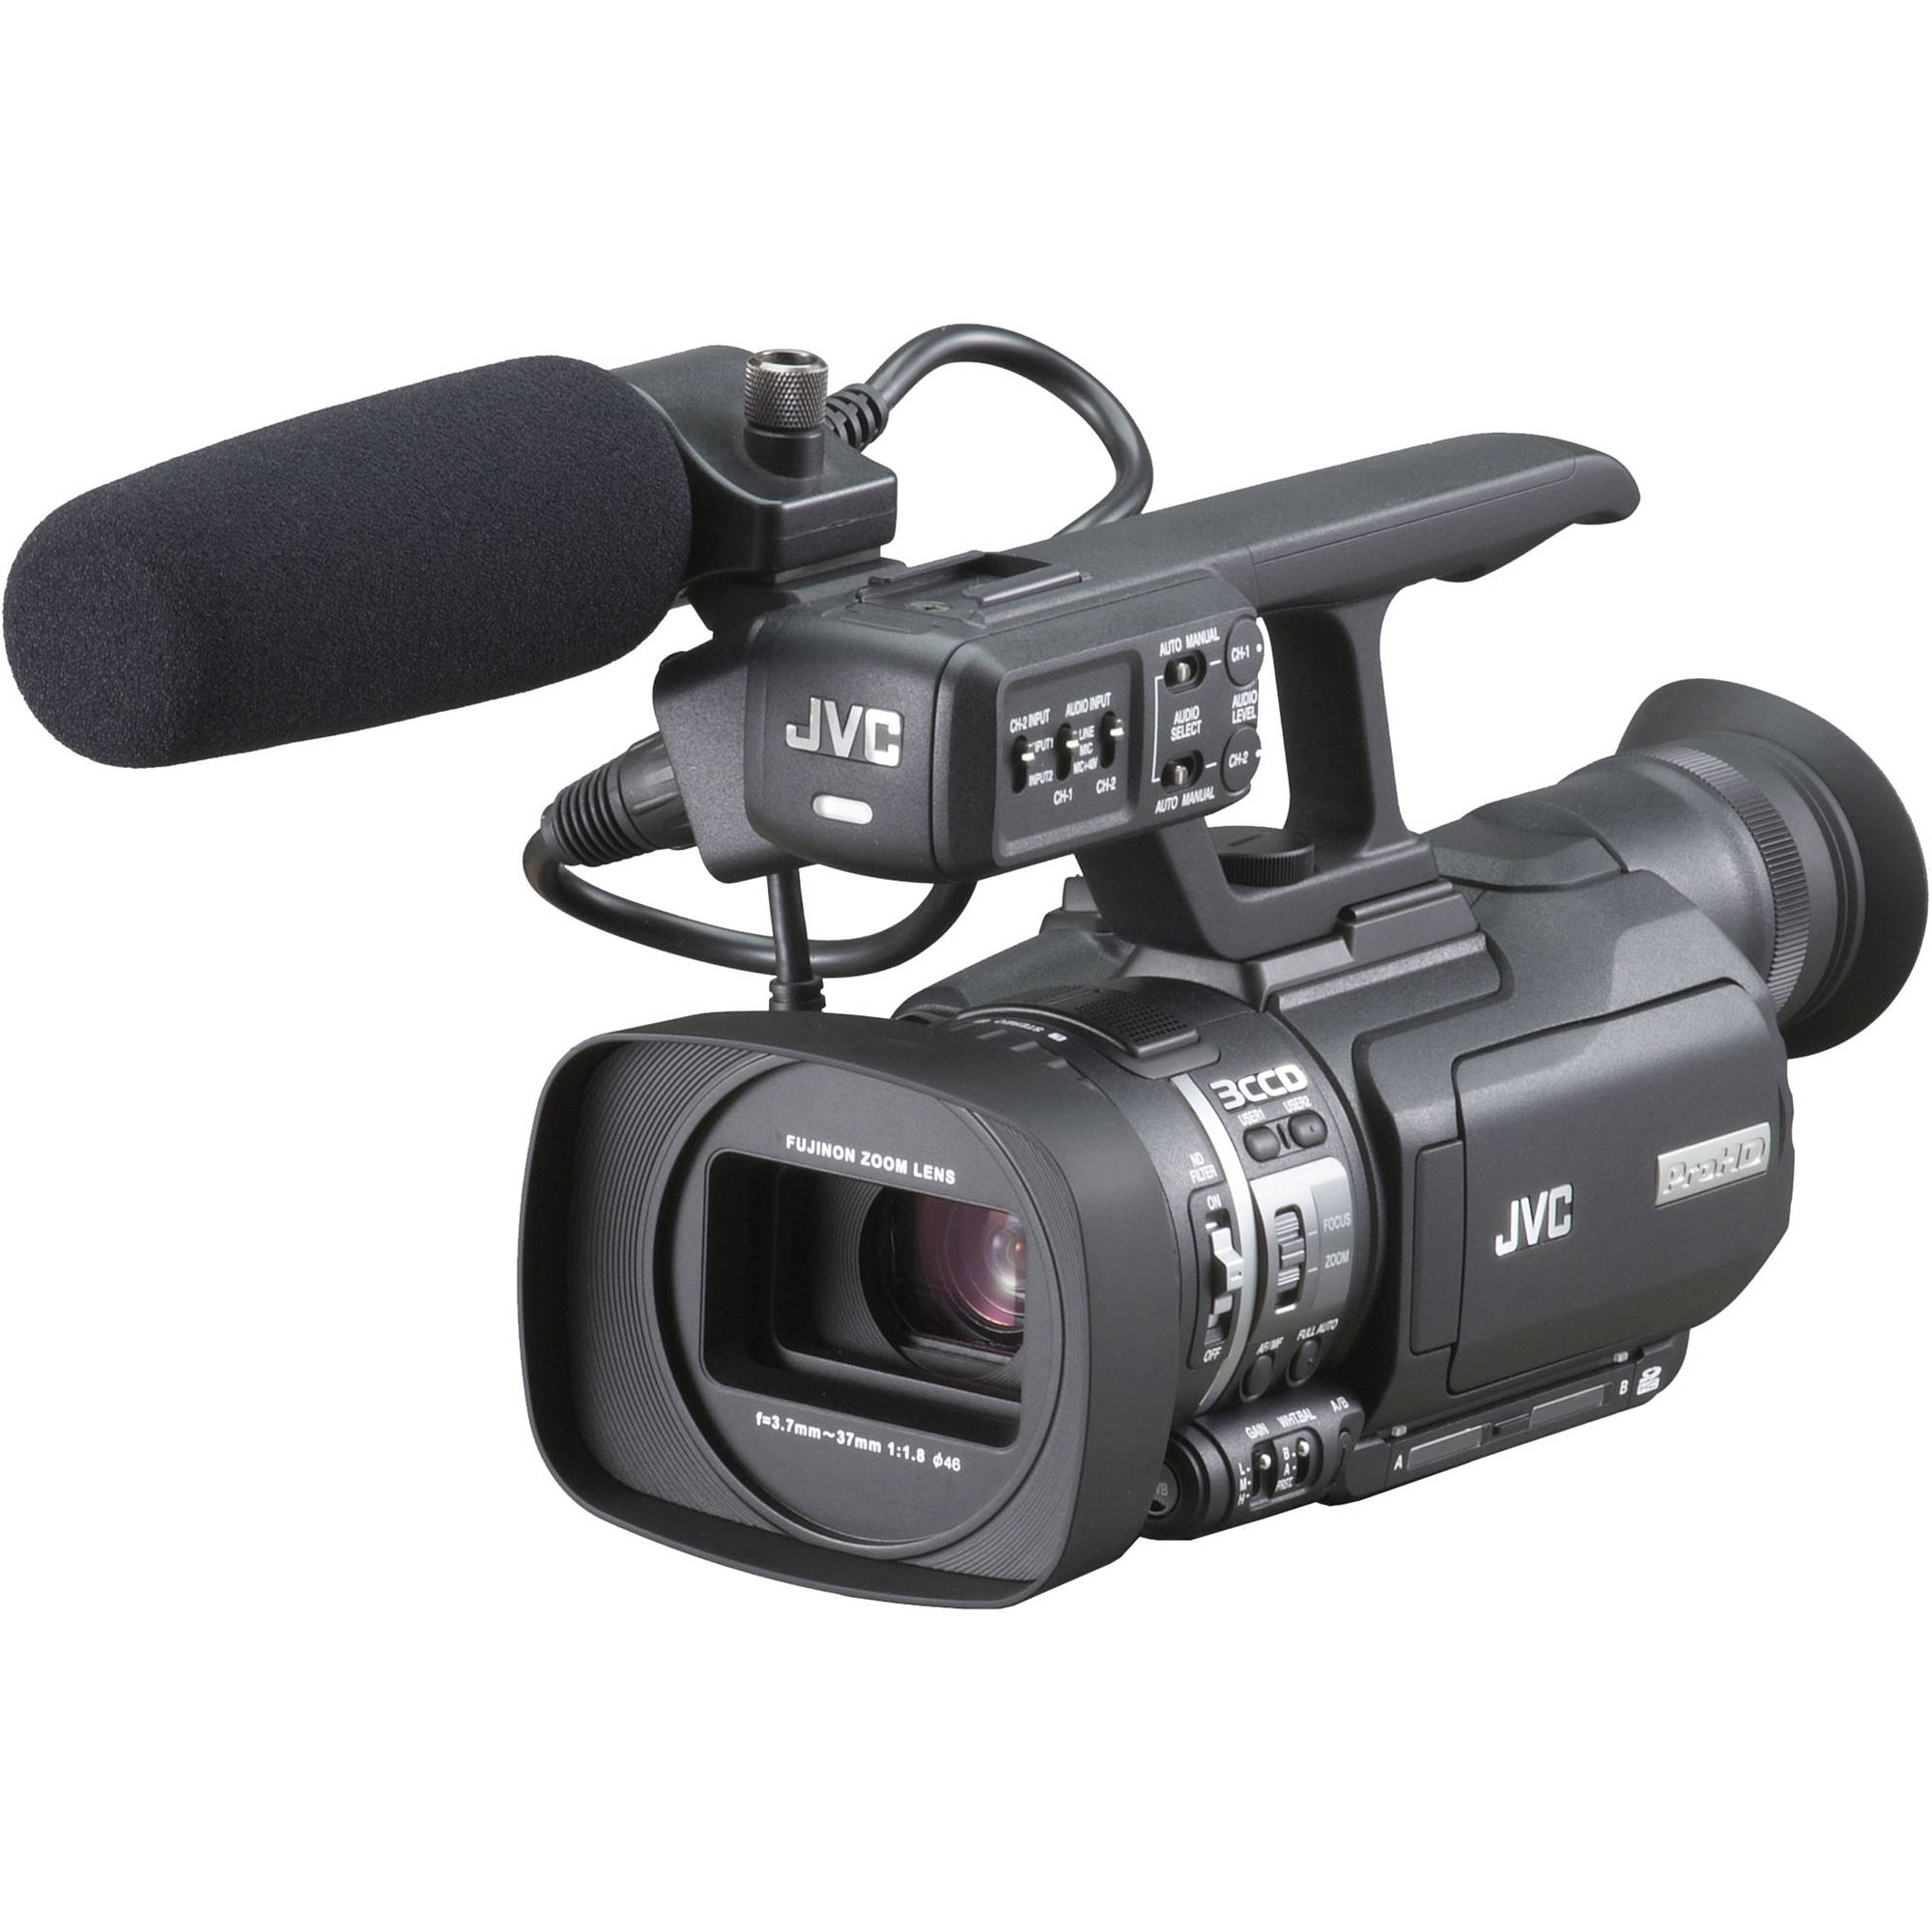 c product  REG JVC GY HMU ProHD Camcorder